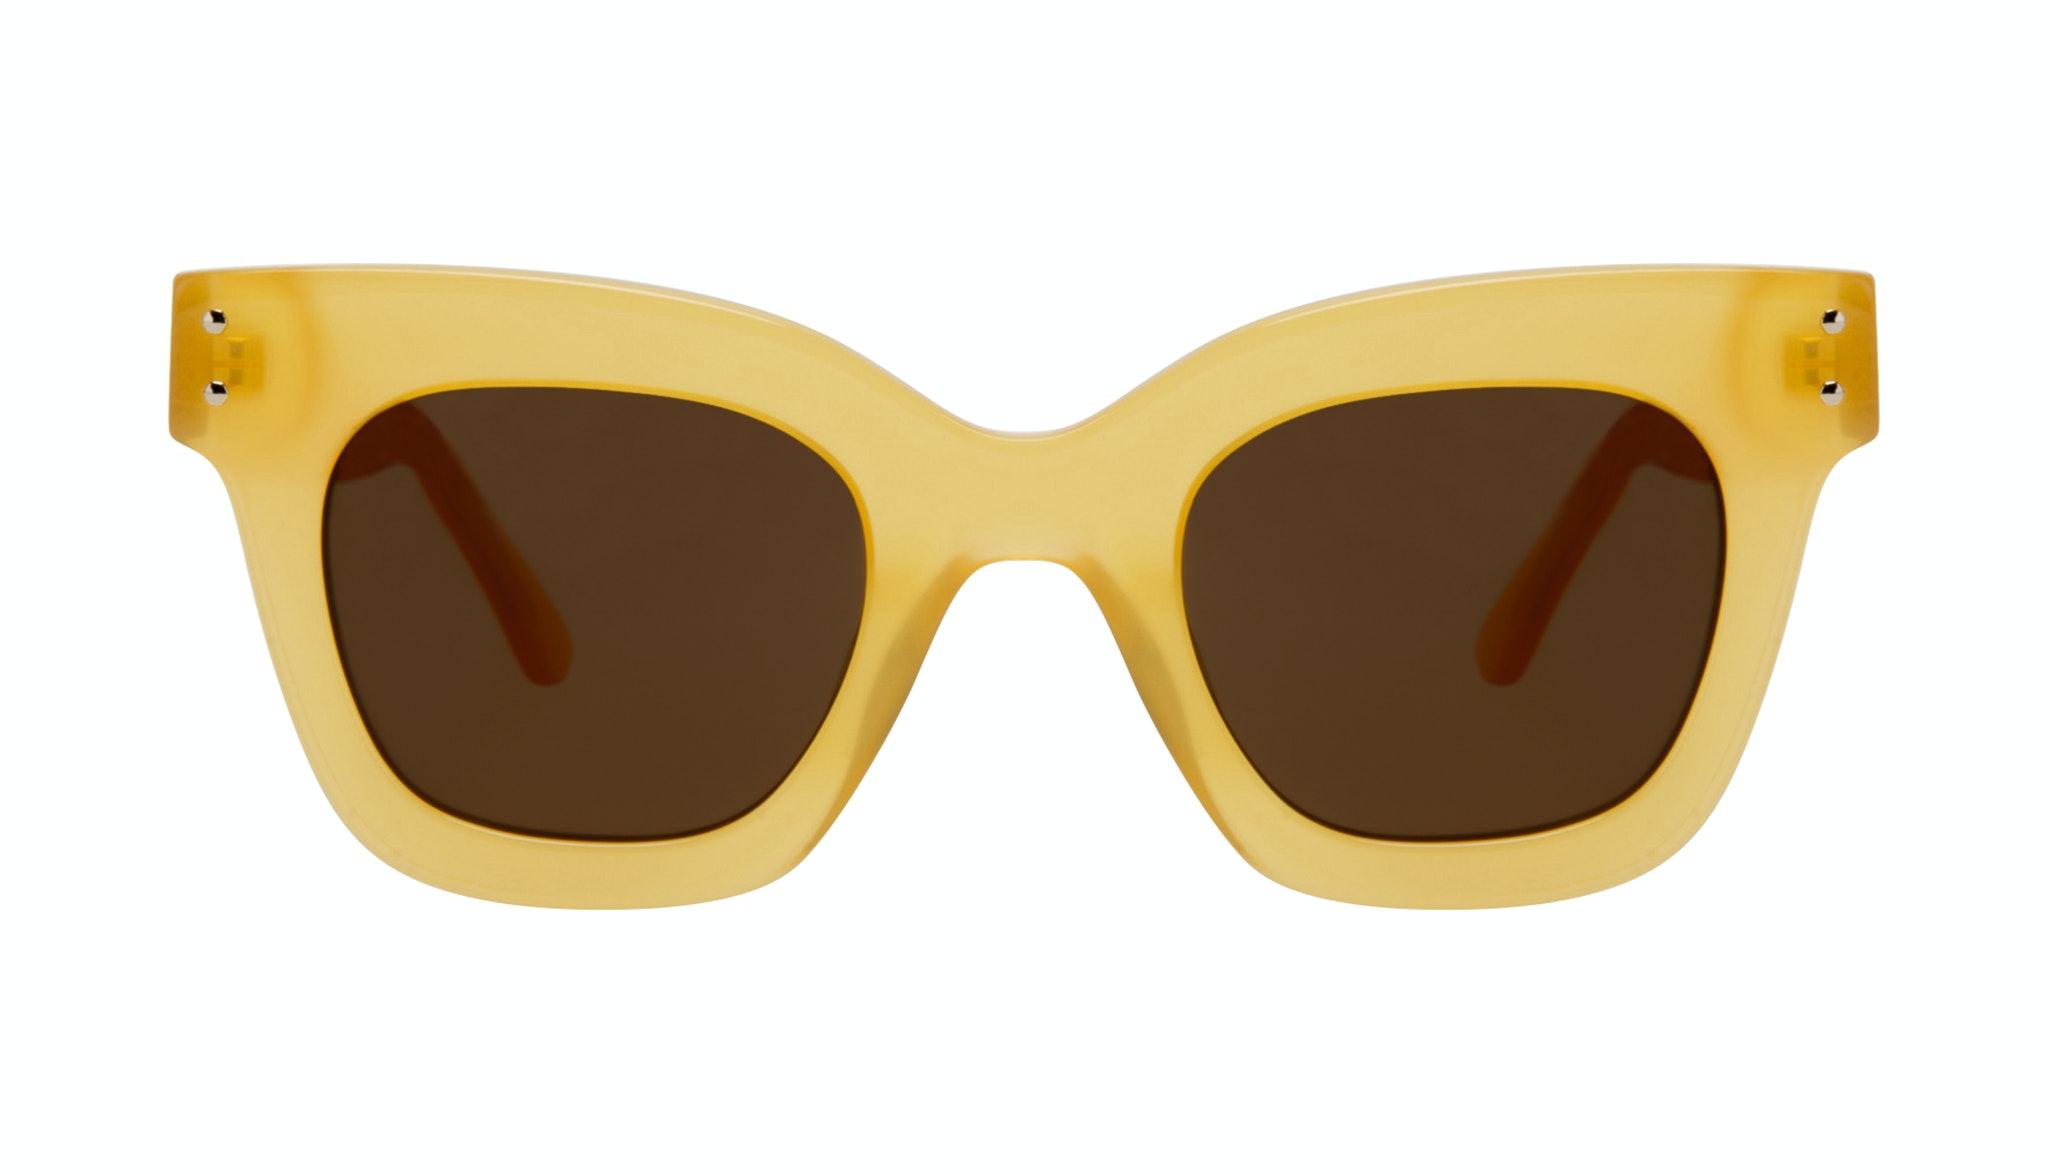 Affordable Fashion Glasses Square Sunglasses Women Fever Lemon Front